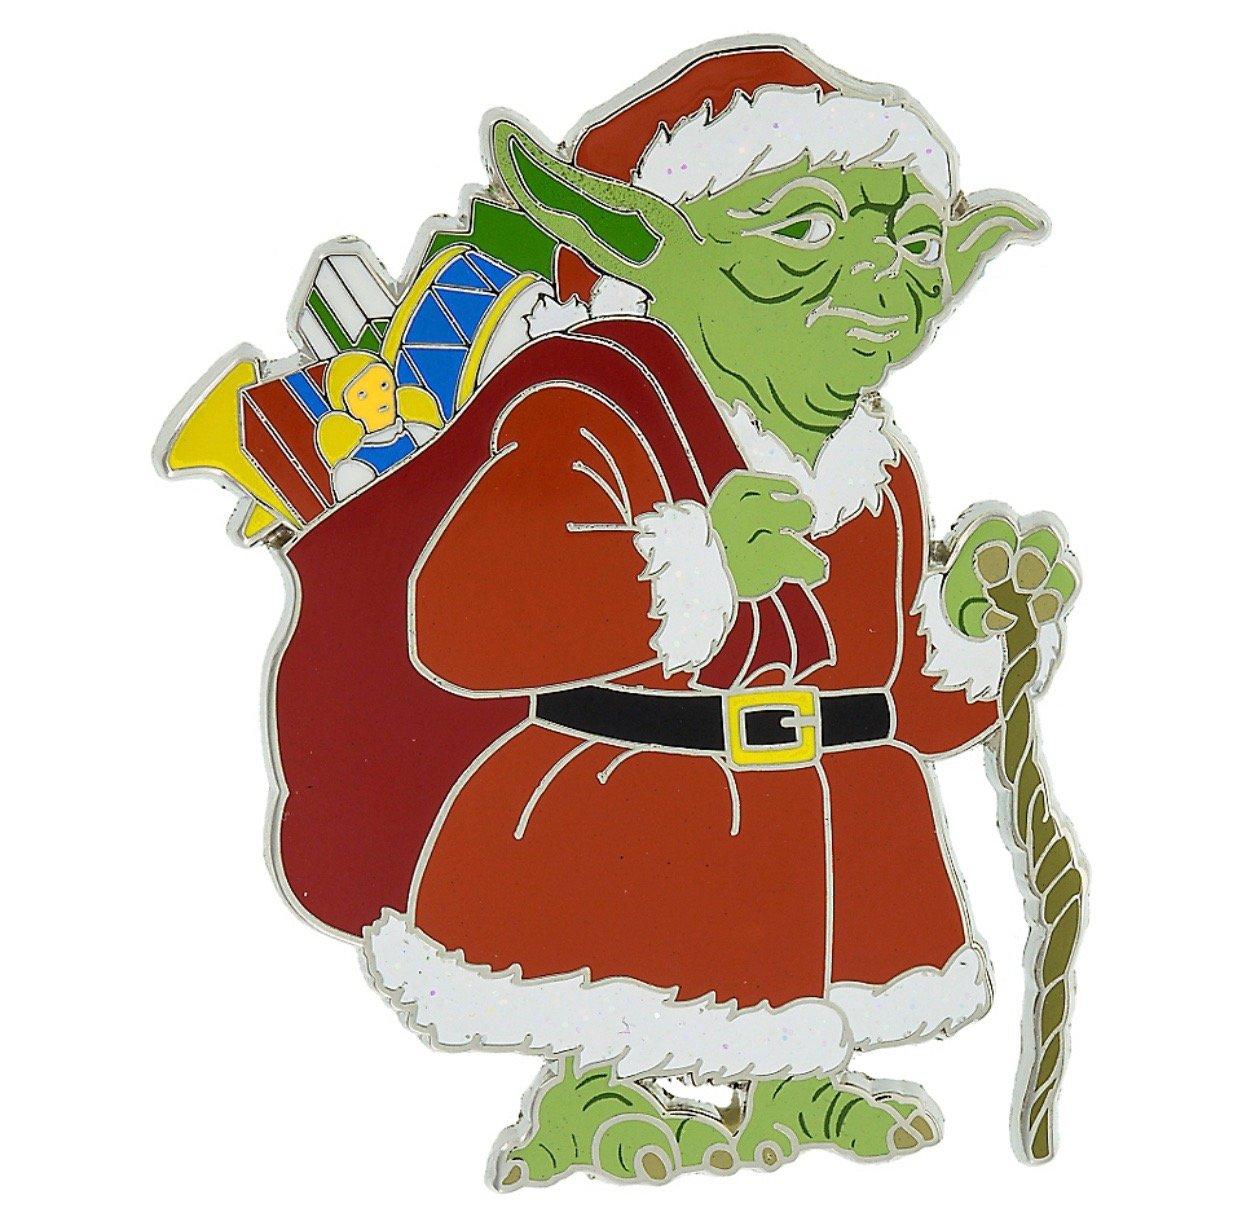 Christmas yoda clipart clipart royalty free download Disney Parks Star Wars Yoda Christmas Holiday Pin New with Card clipart royalty free download